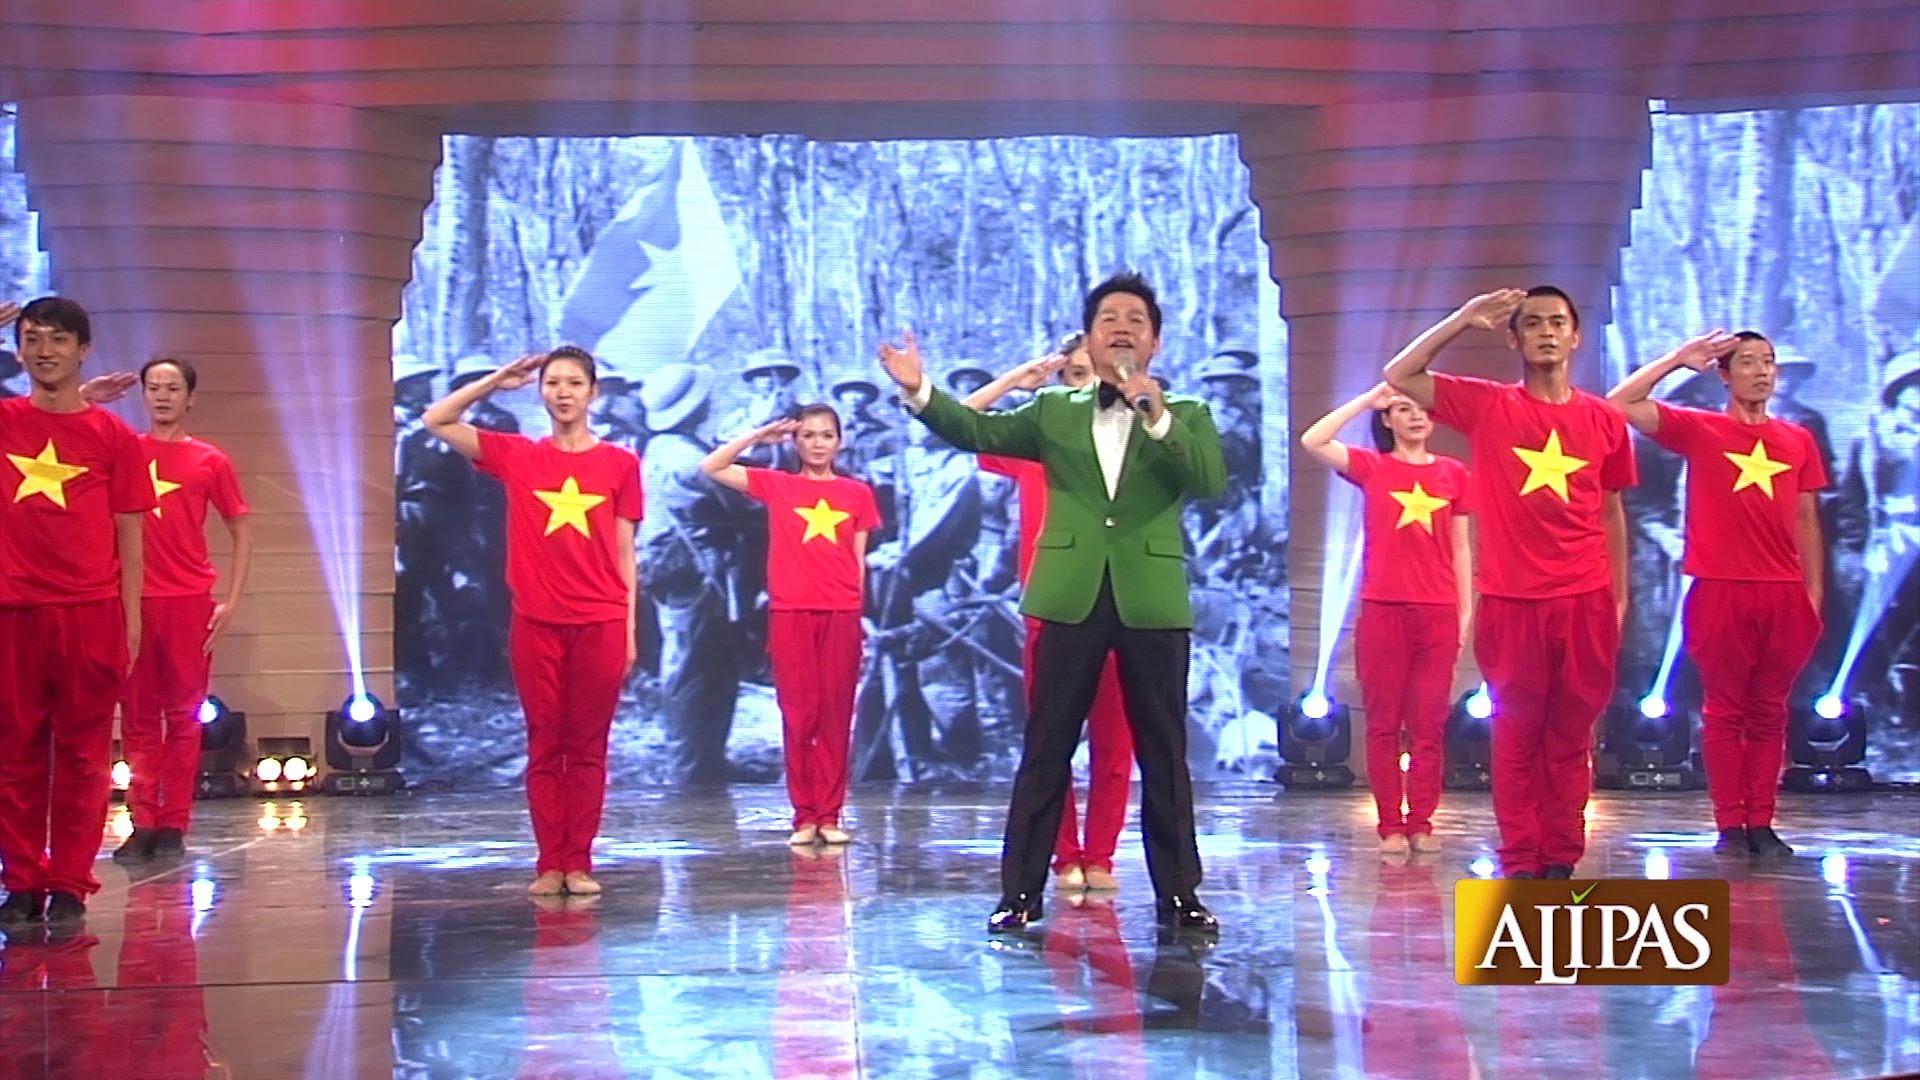 Beberapa aransemen  baru dari aliran lagu-lagu revolusioner Vietnam